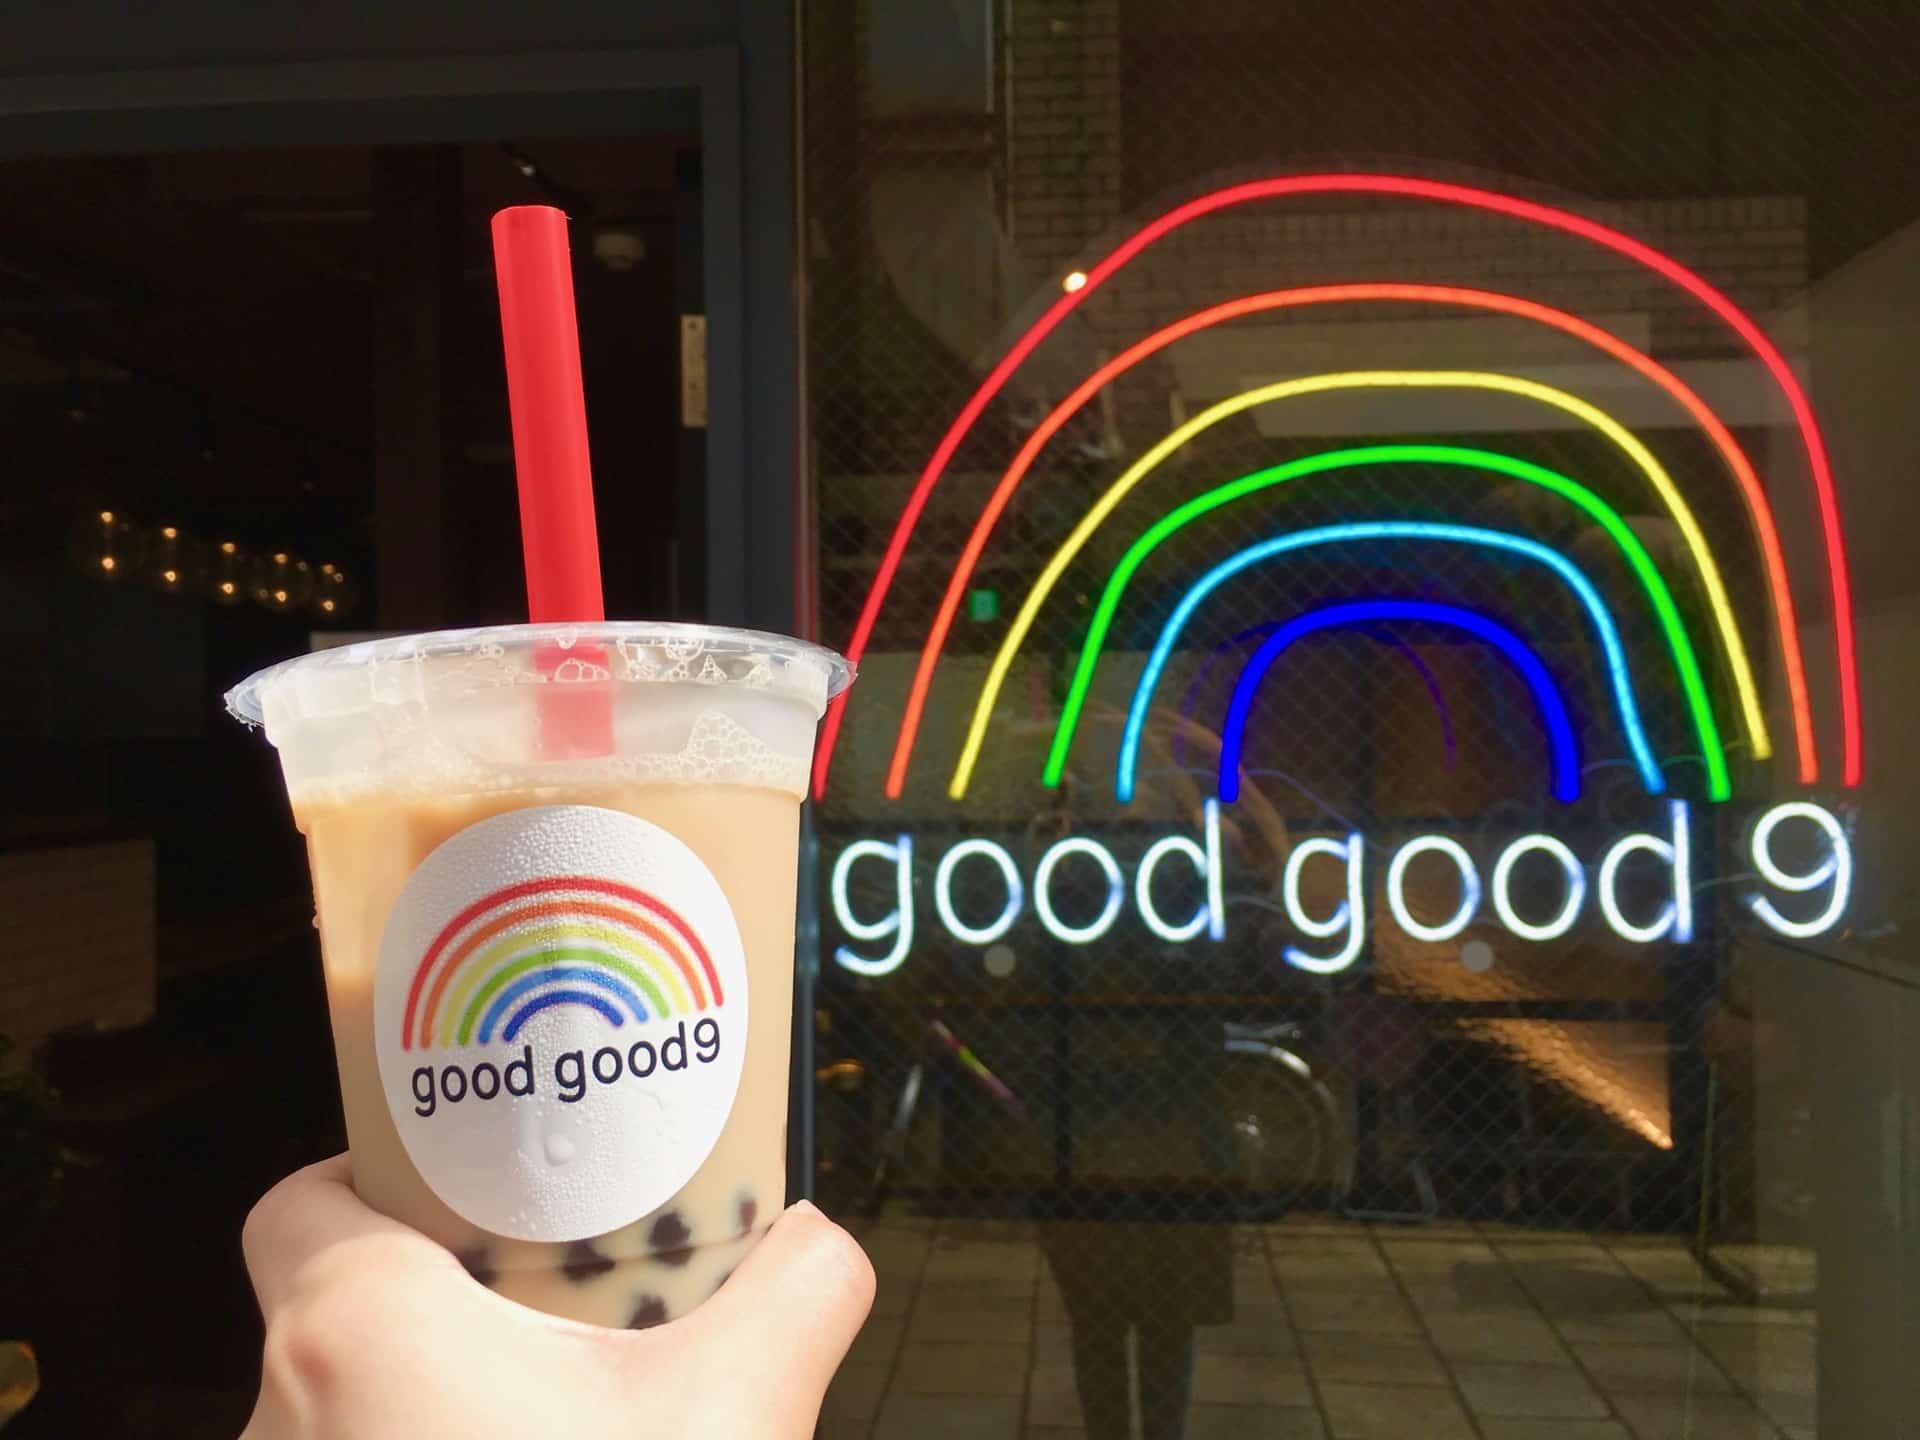 goodgood9 − 神戸・南京町のタピオカドリンク店。300円で本格派の味わいが楽しめる